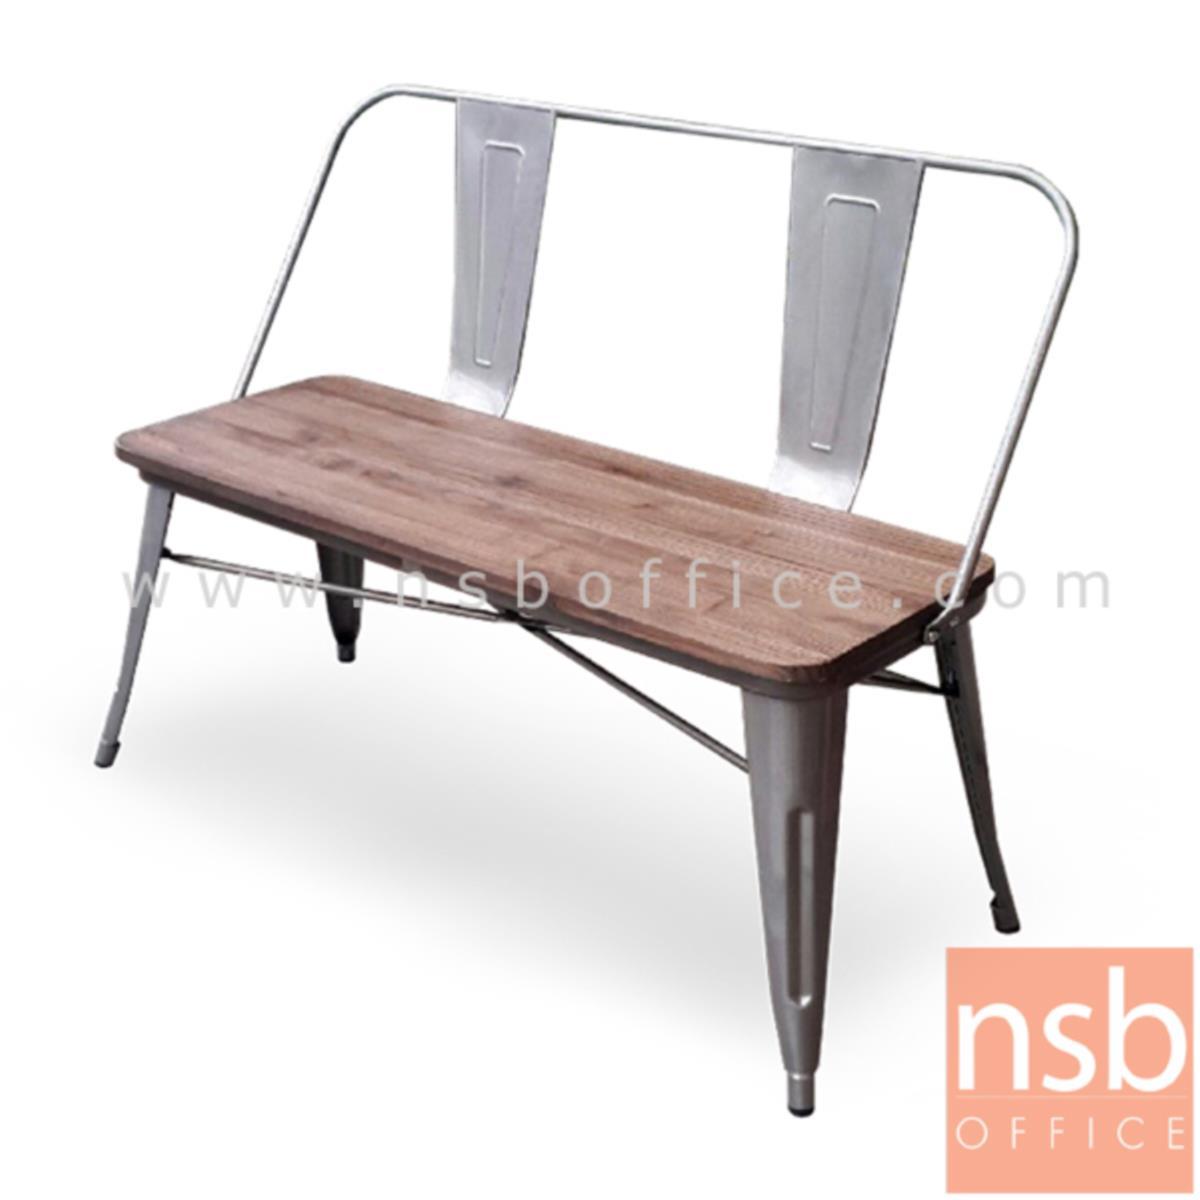 G08A243:เก้าอี้สนามโมเดิร์นโครงเหล็ก  รุ่นGMP-9289  ที่นั่งไม้